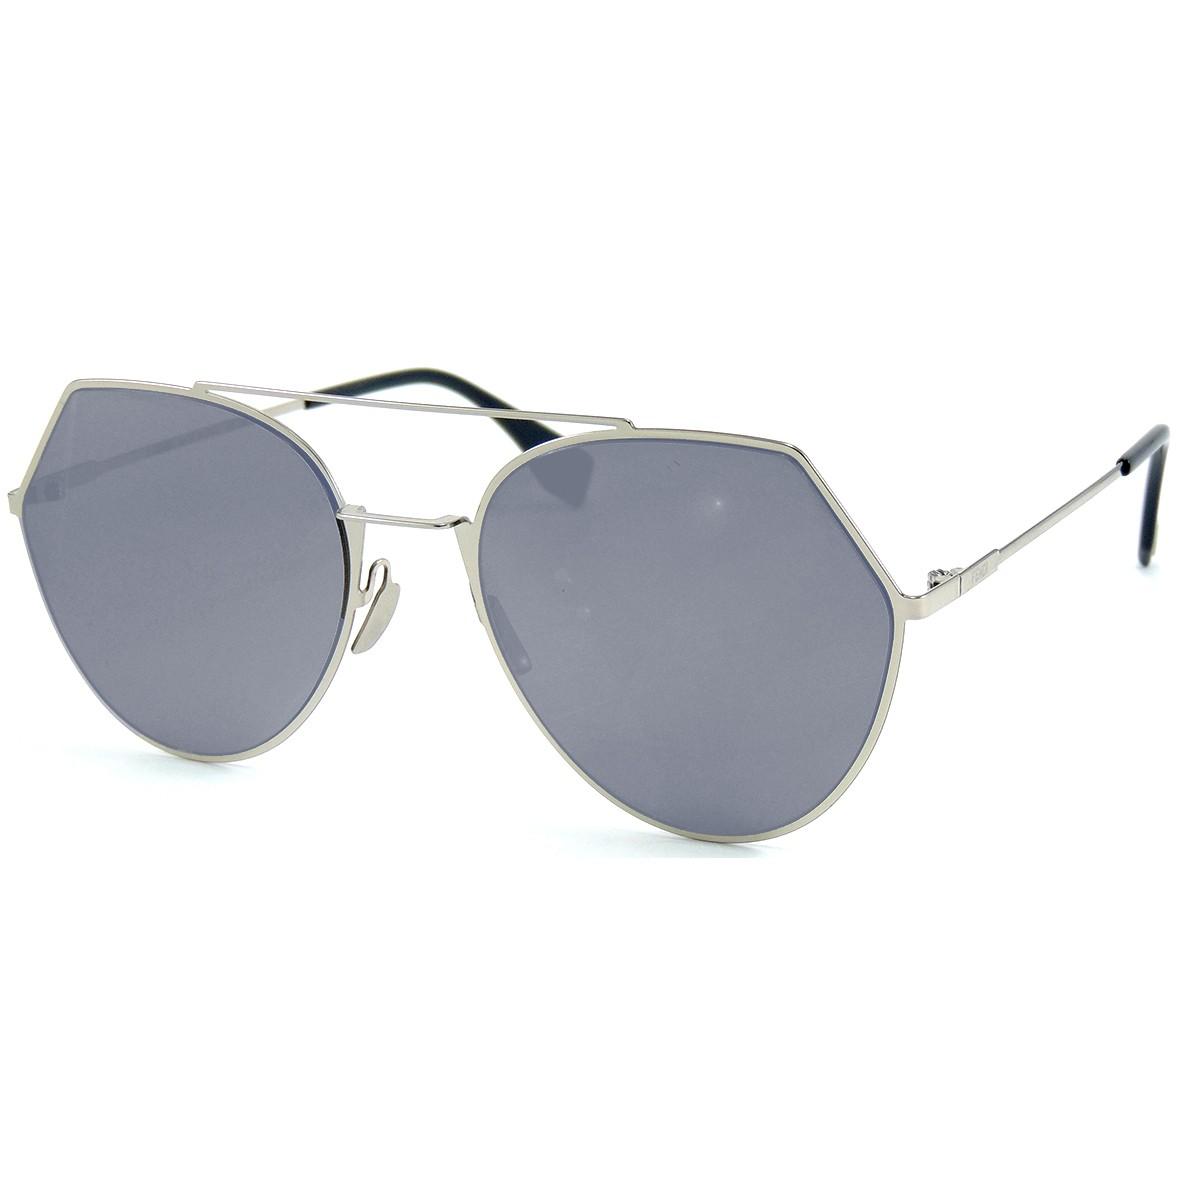 9473a3ac8559f Compre Óculos de Sol Fendi Eyeline em 10X